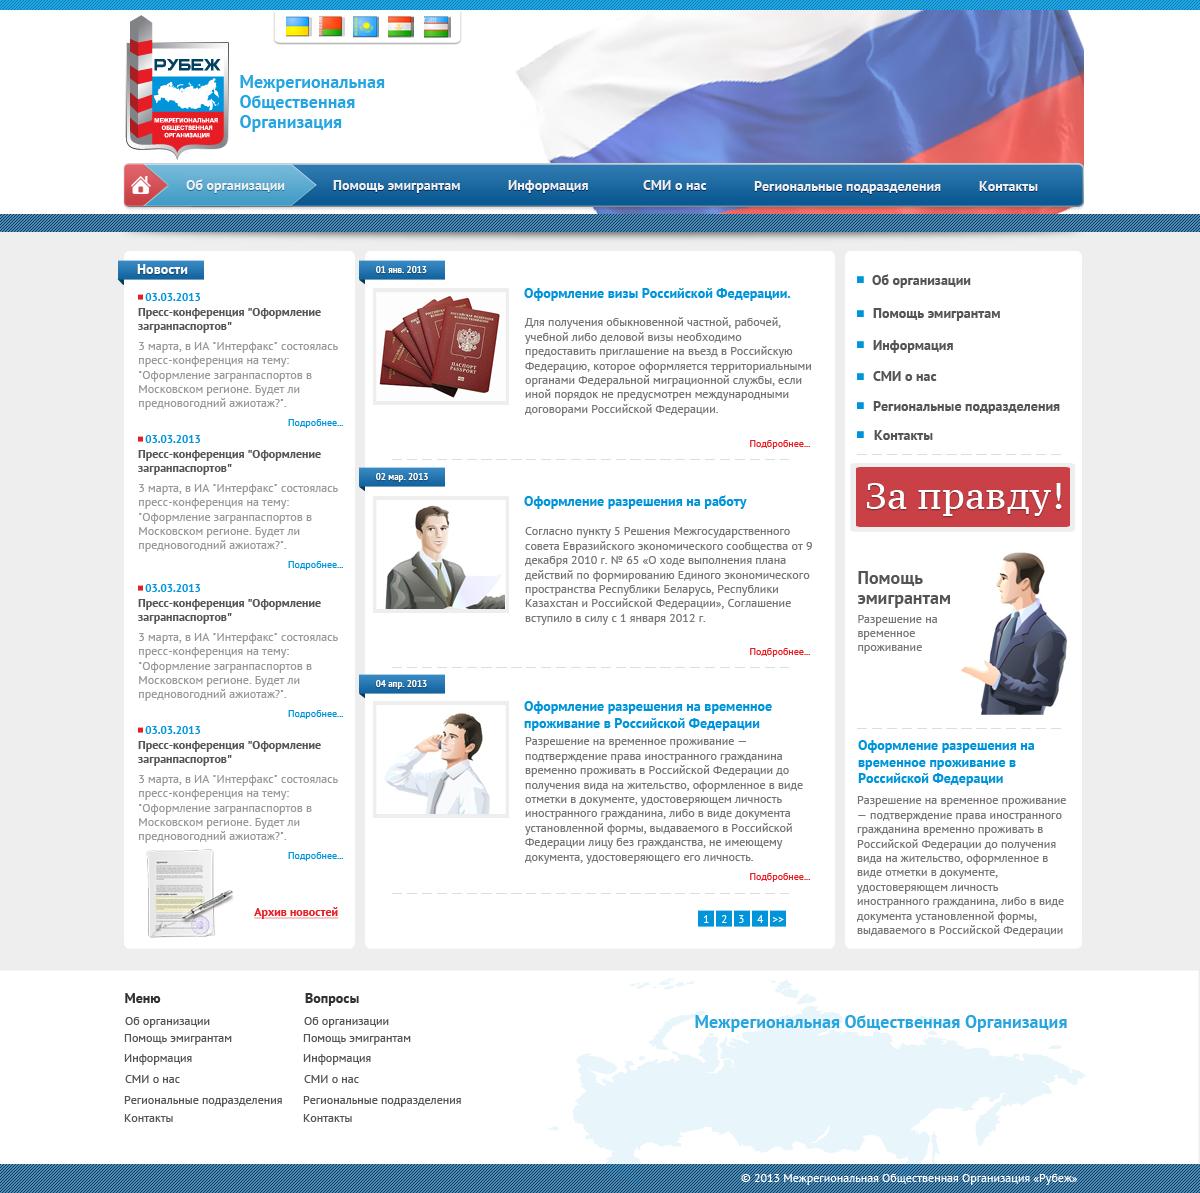 Разработка дизайна сайта общественной организации фото f_363513b0bcc8a224.png